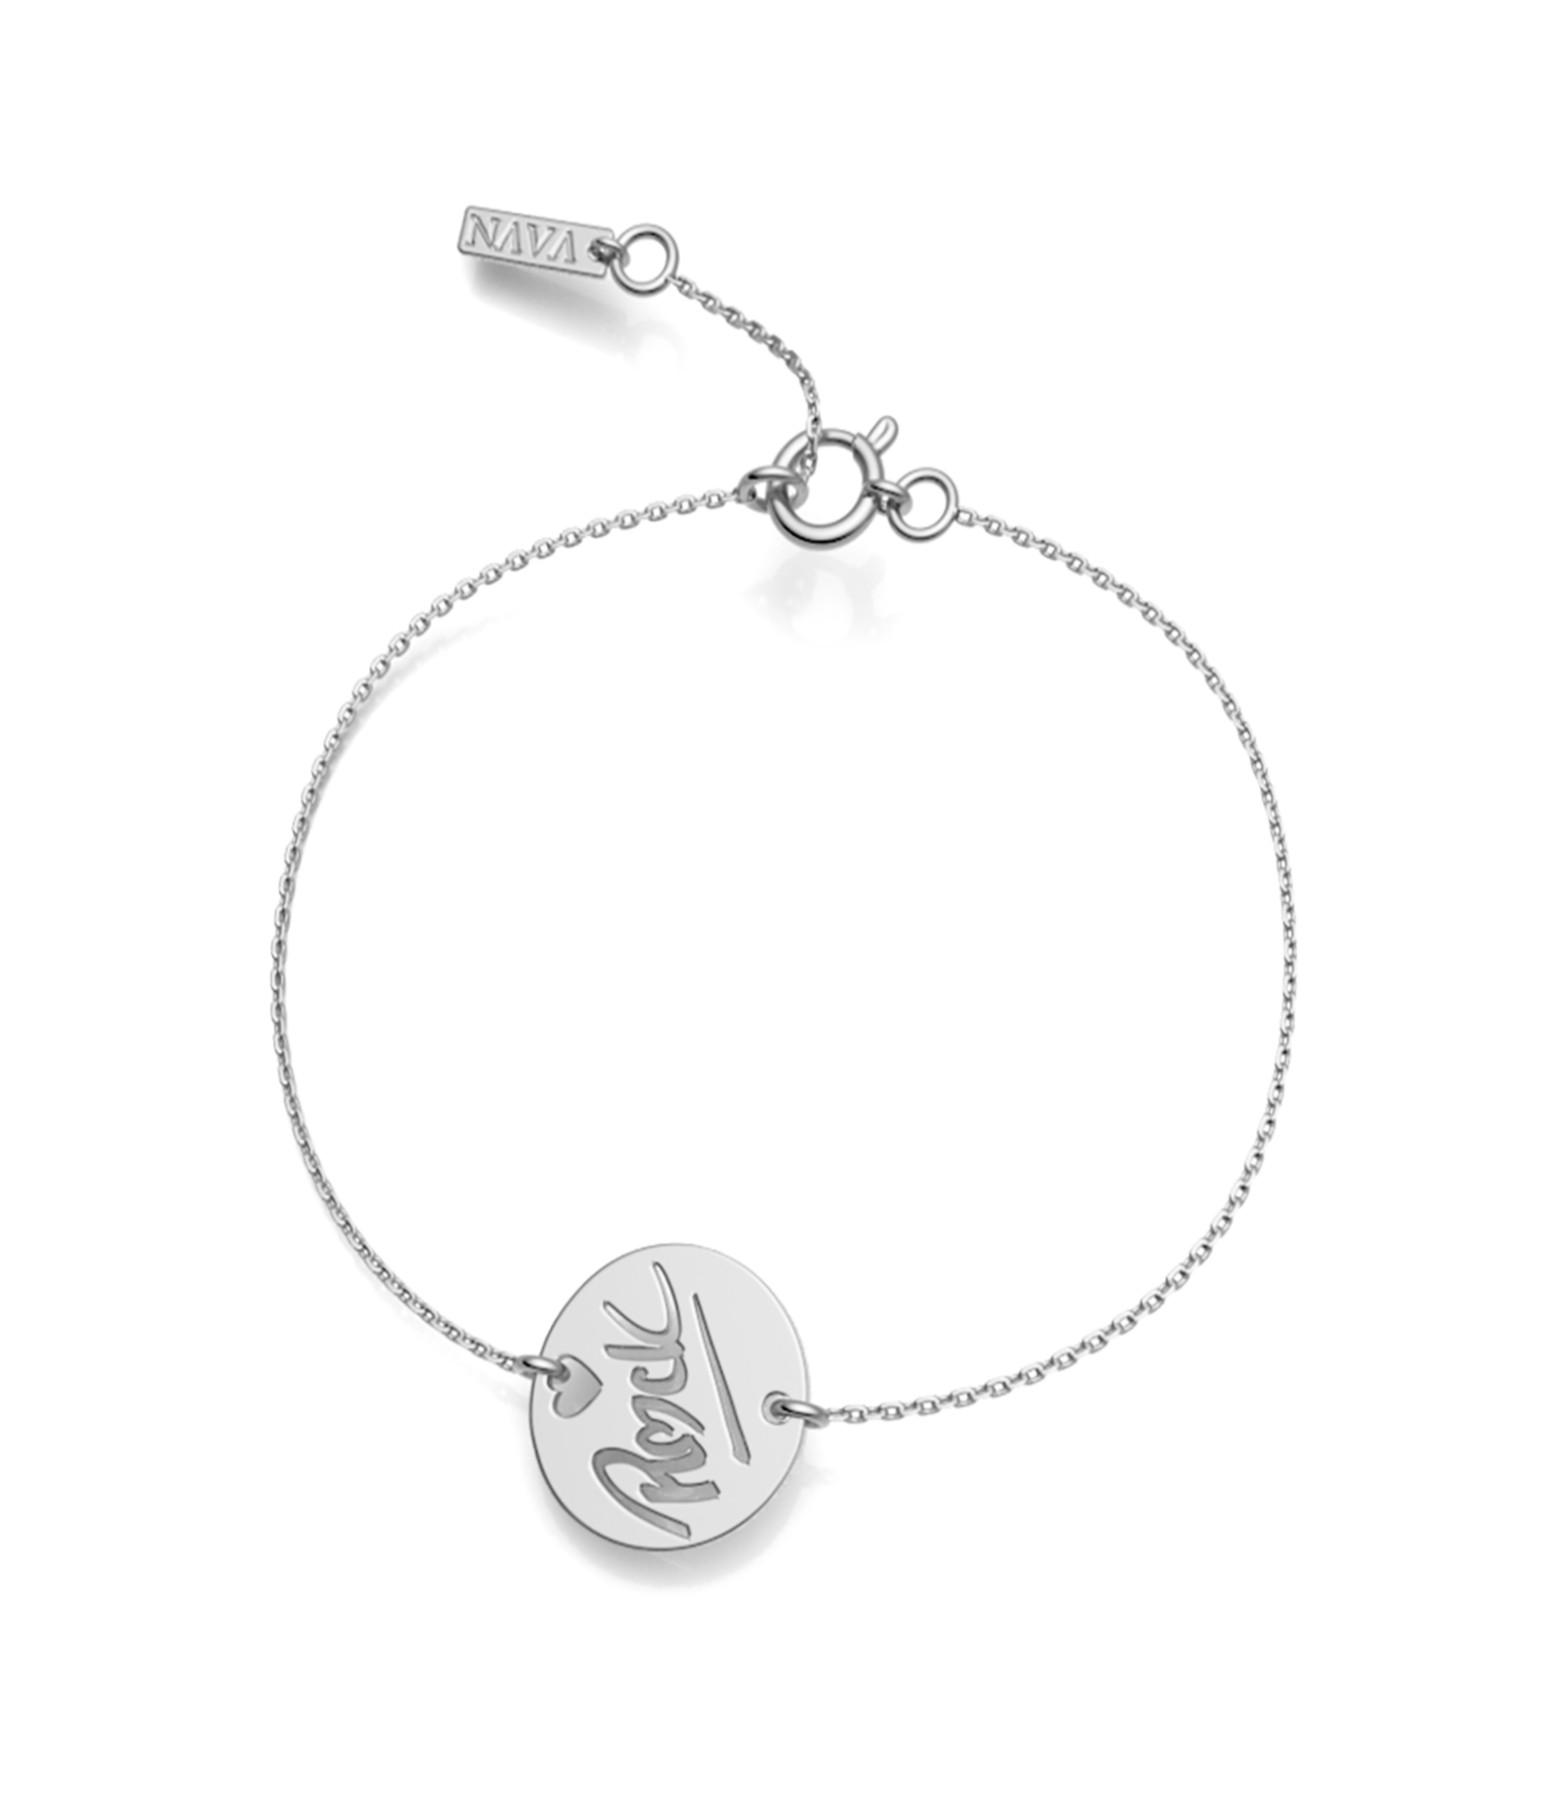 NAVA JOAILLERIE - Bracelet Rock S Or Blanc